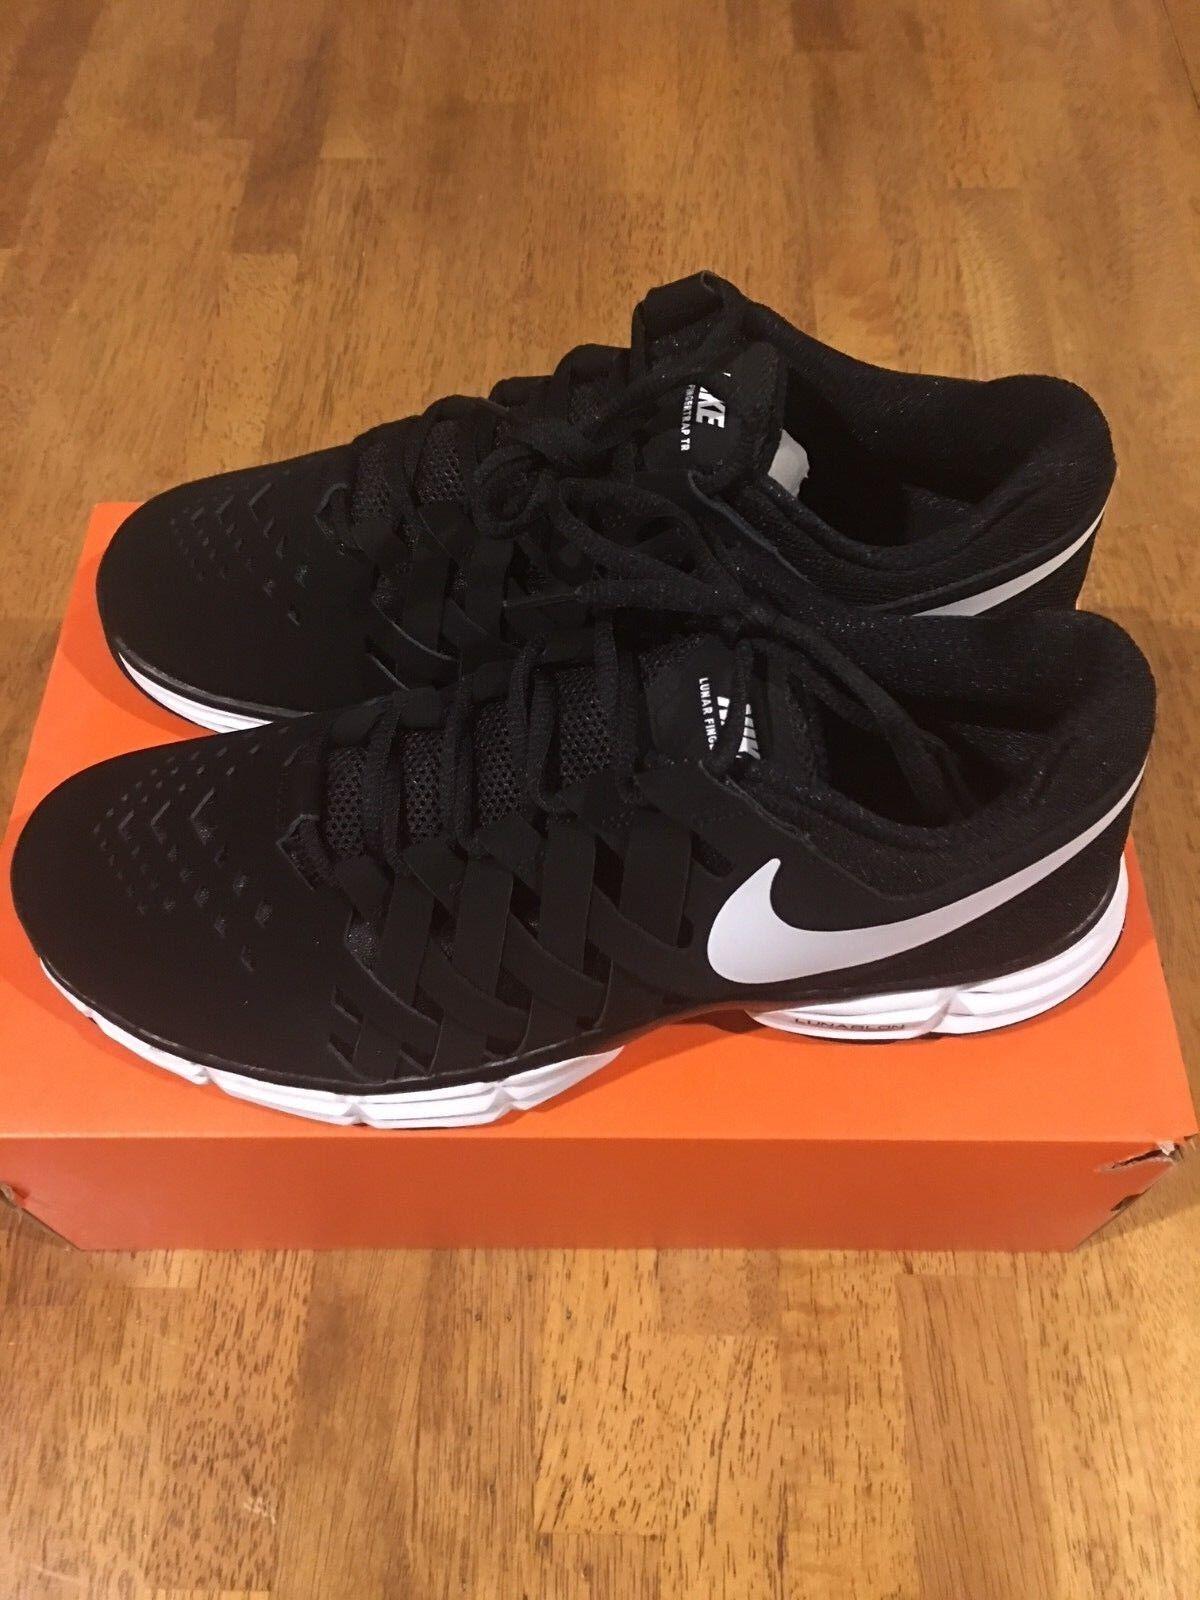 Nike Lunar Fingertrap TR Men's 898066 Shoes Size 10 Black 898066 Men's 001 NEW In Box 3c4fe1